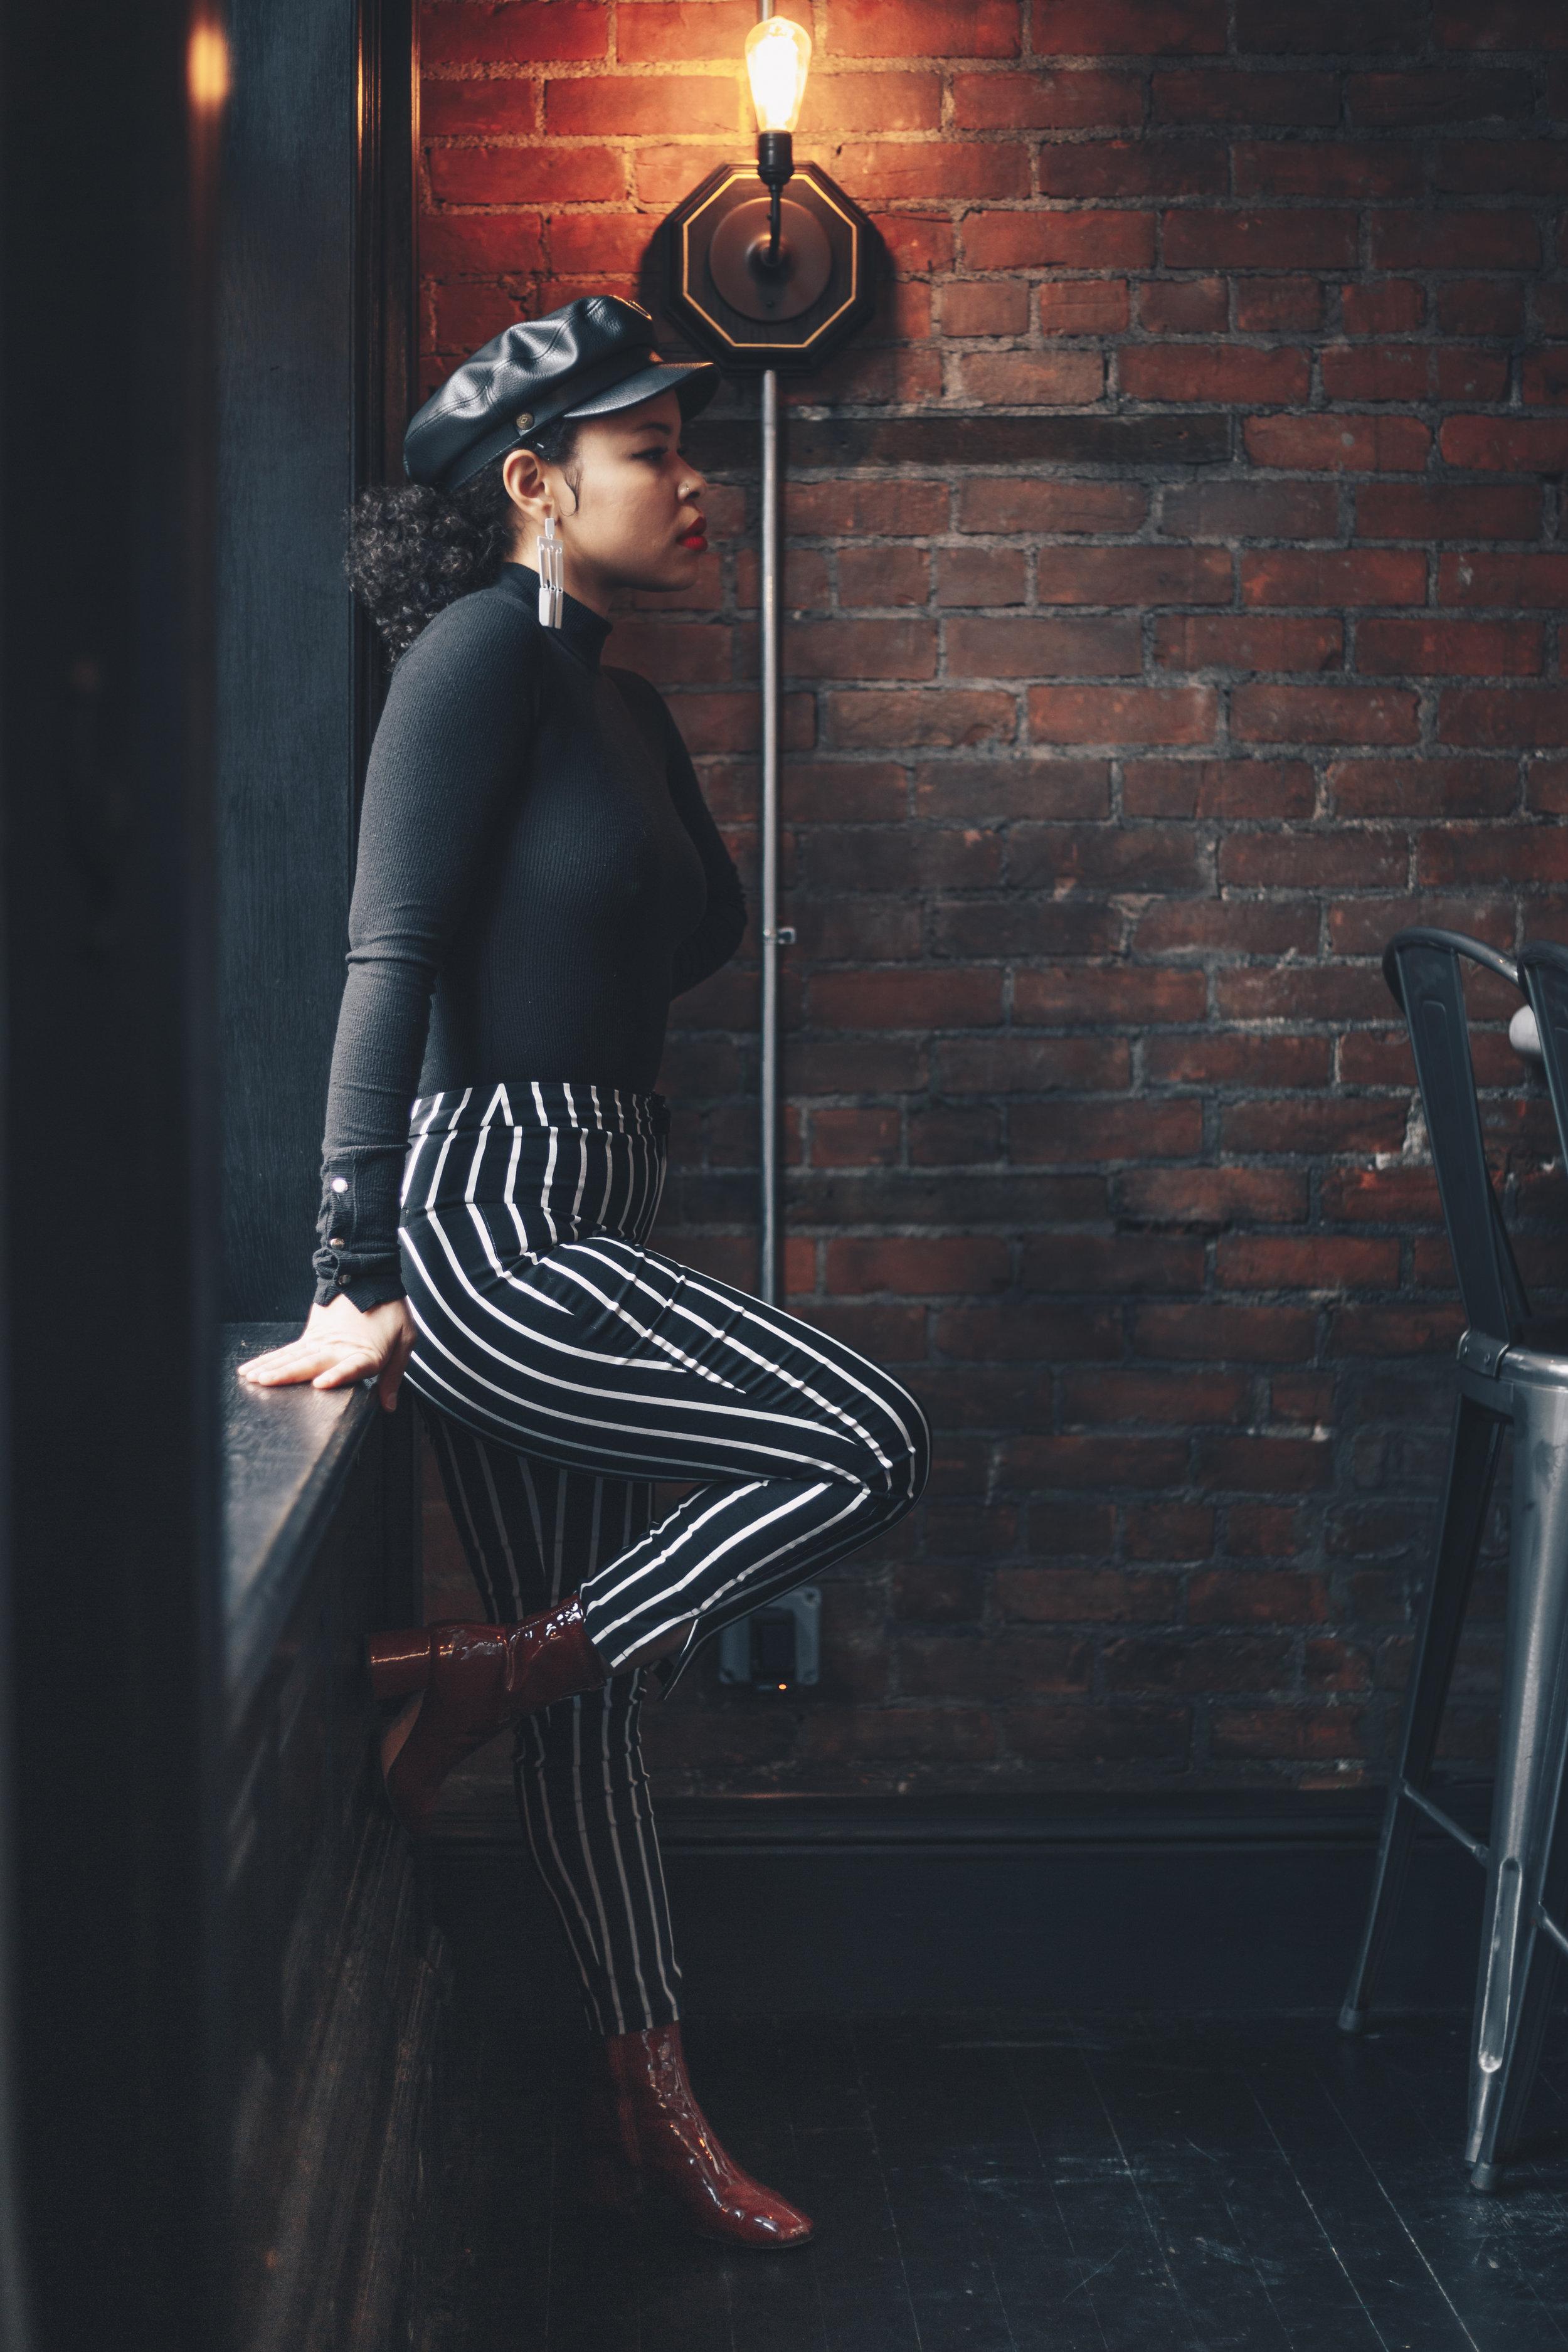 BodySuit and booties: Zara/ Pants: Forever 21/ Earrings: Asos/ Hat: Brixton